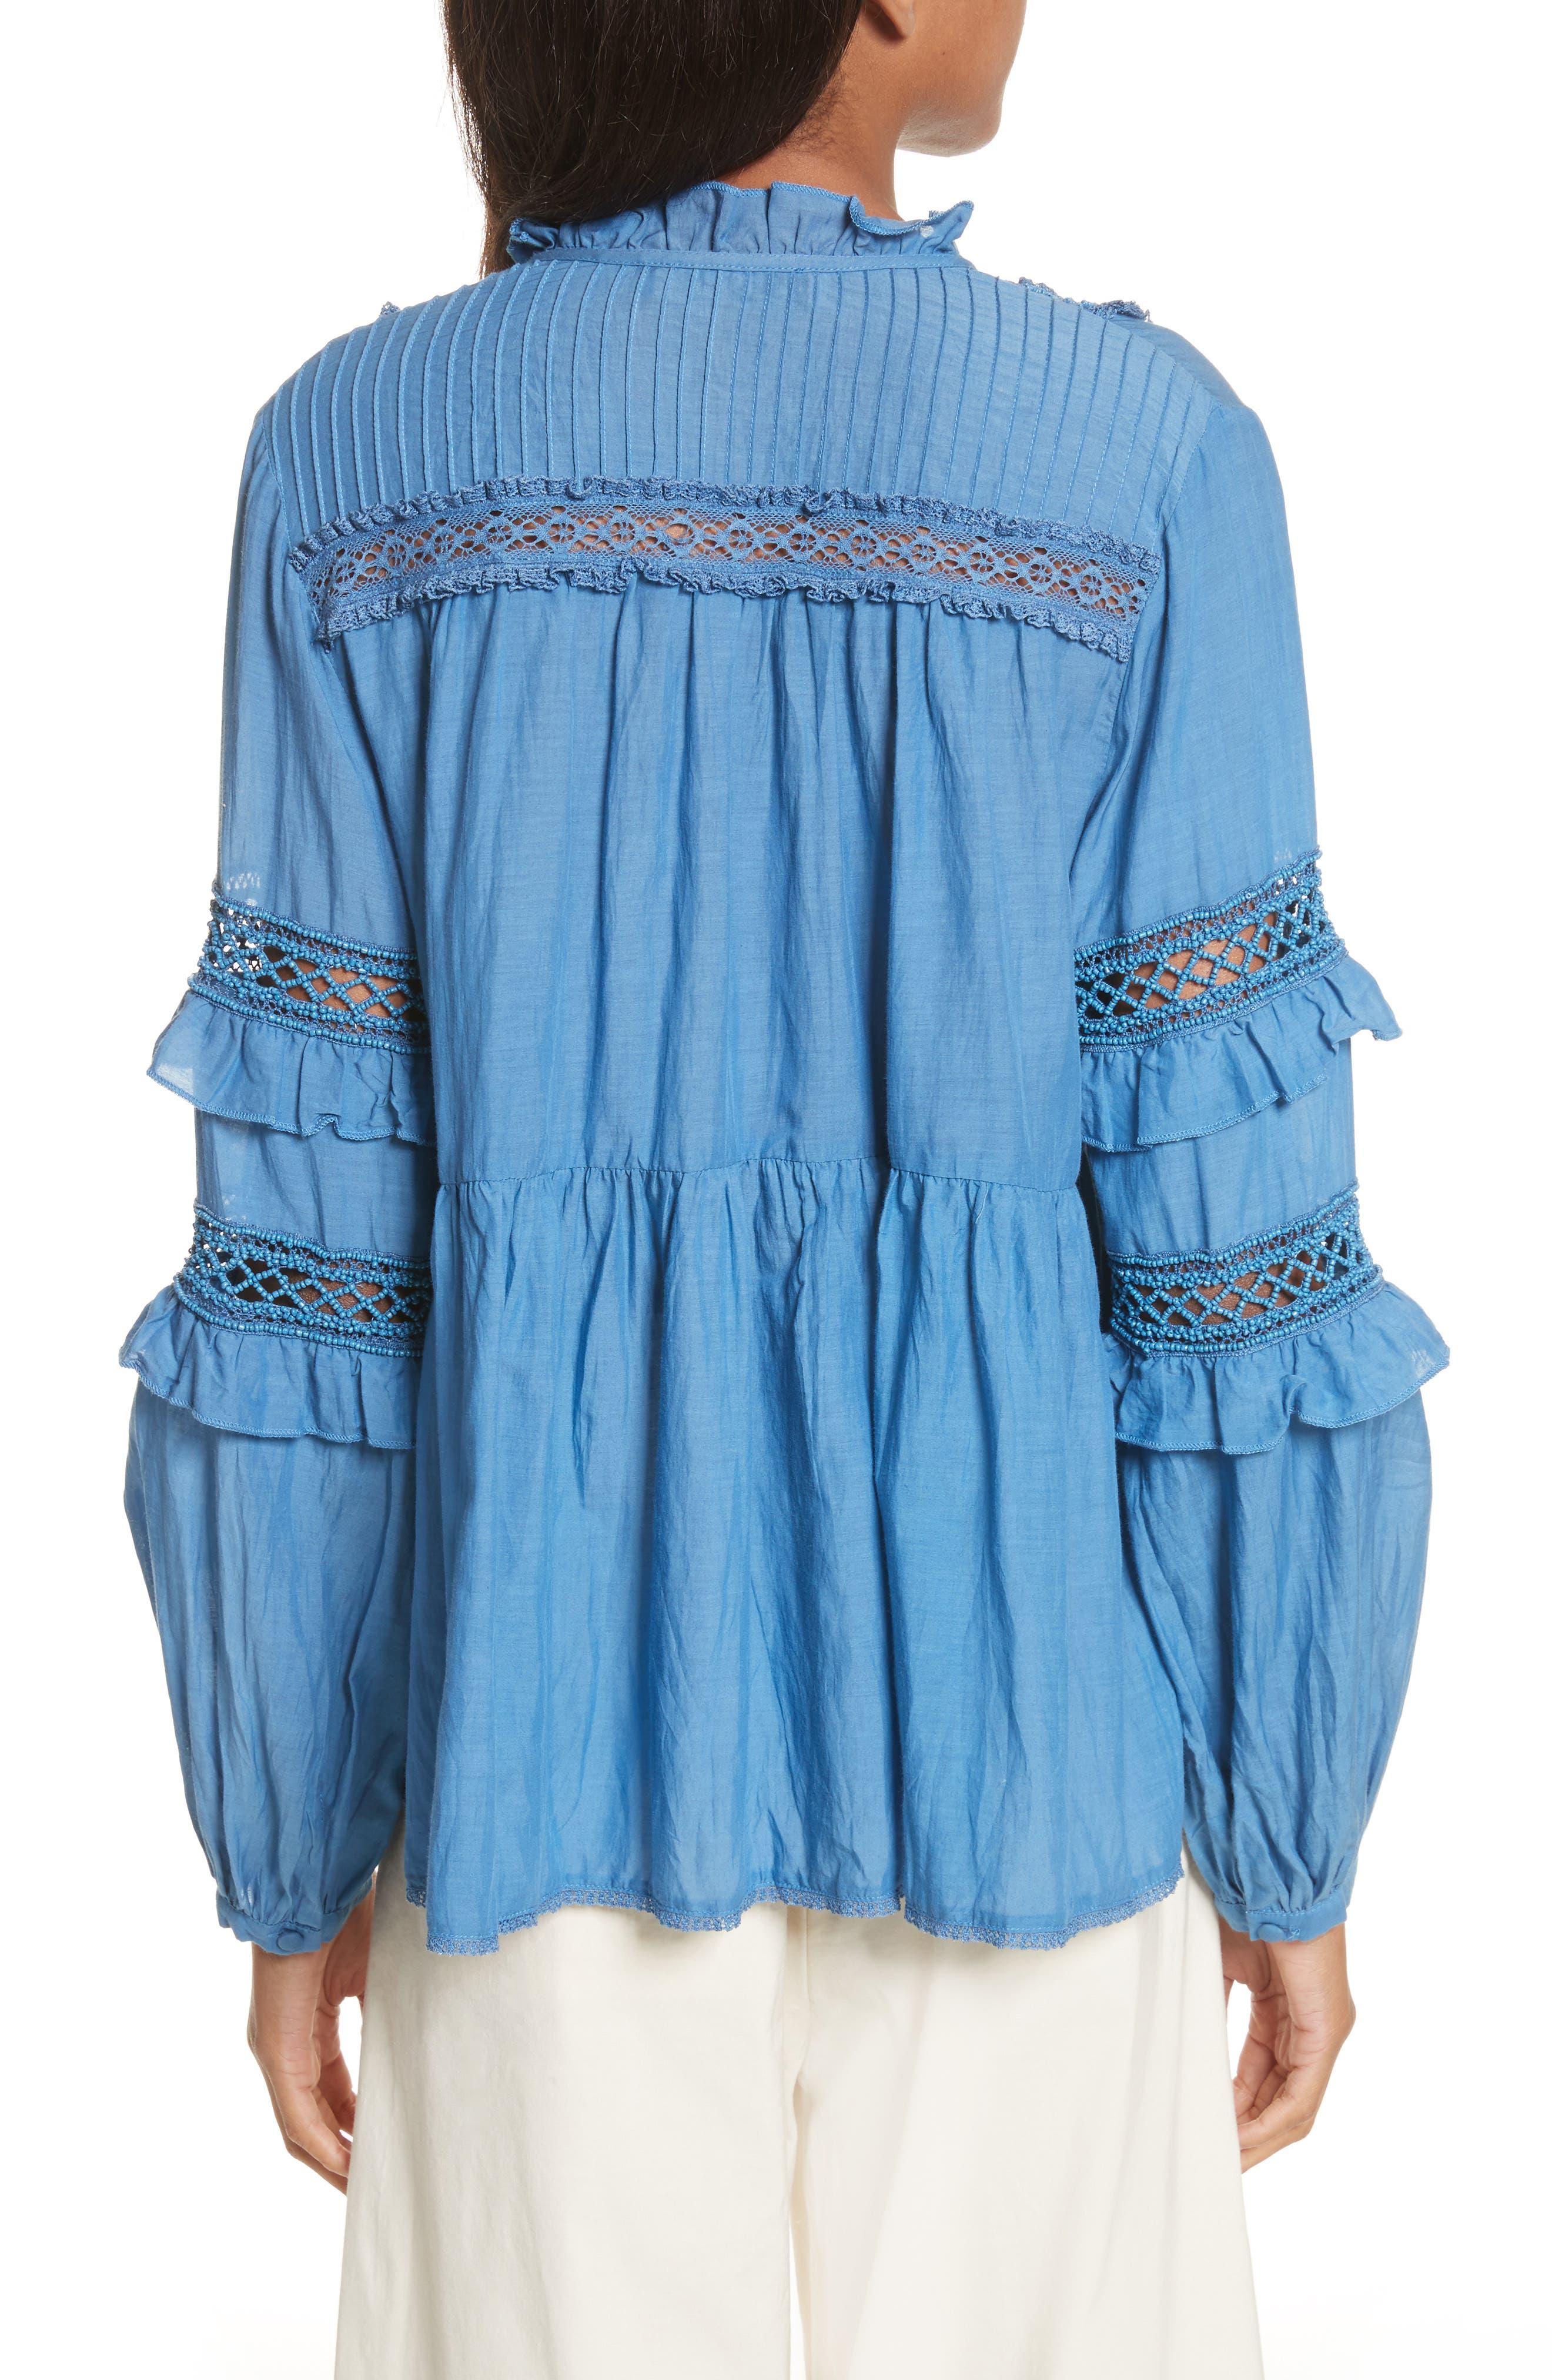 Adaline Ruffle Cotton Blouse,                             Alternate thumbnail 3, color,                             Blue